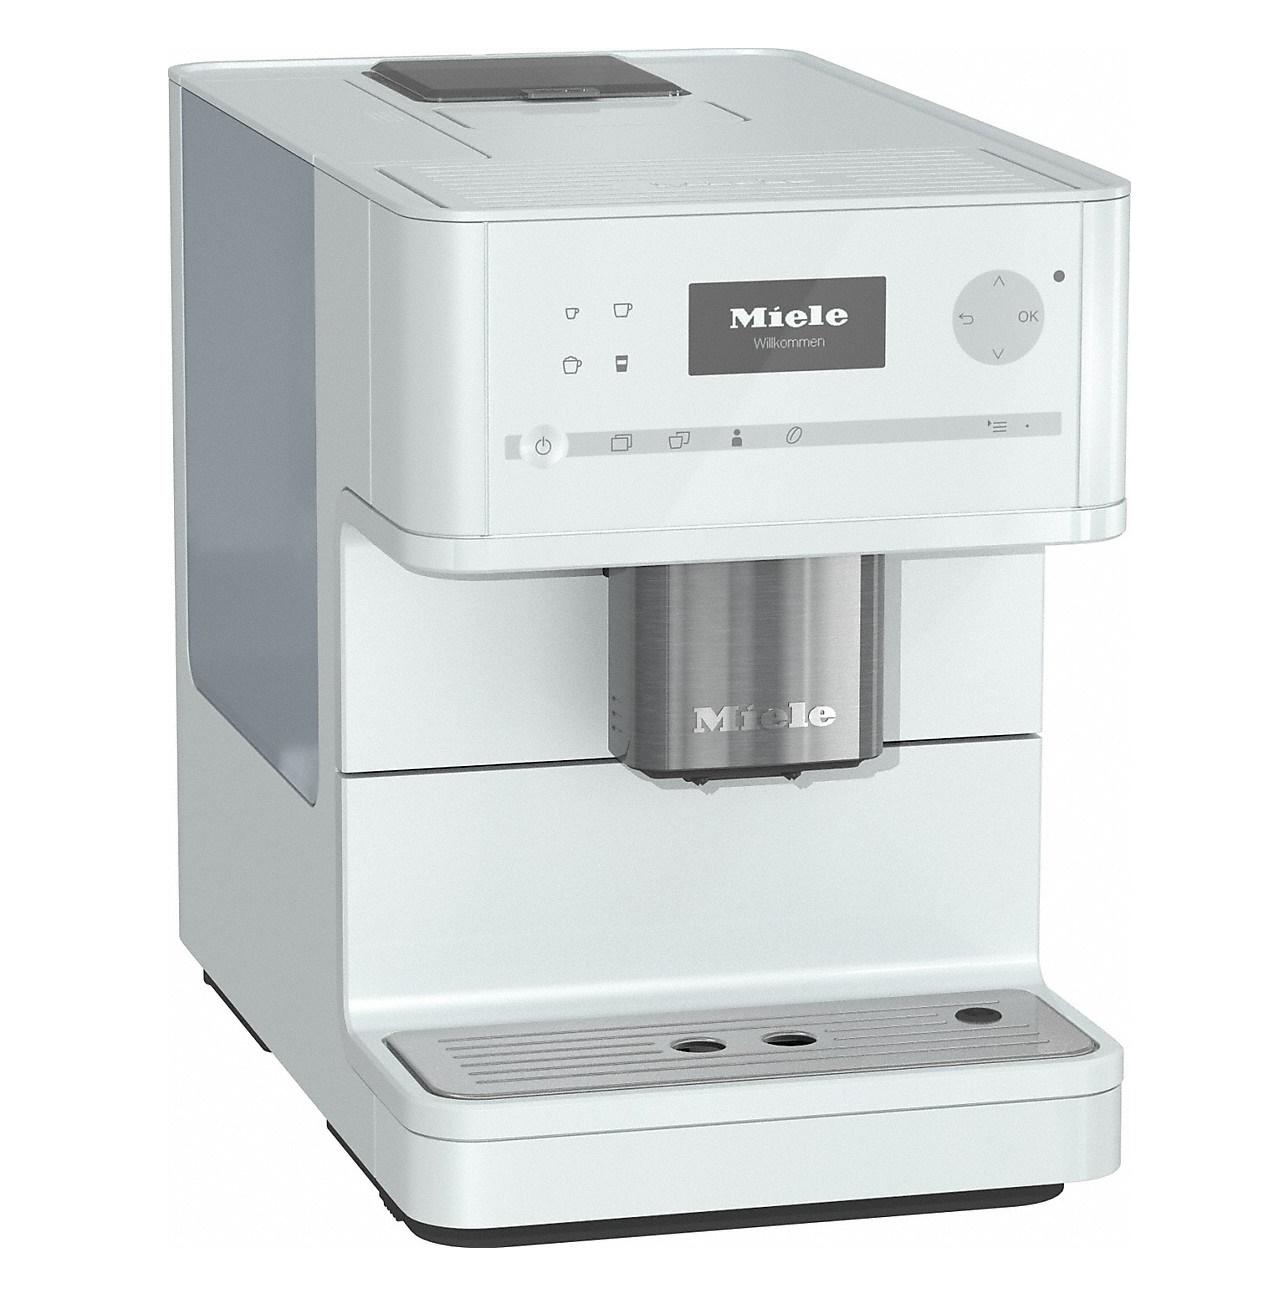 Miele stoni kafe aparat CM 6150 - Inelektronik